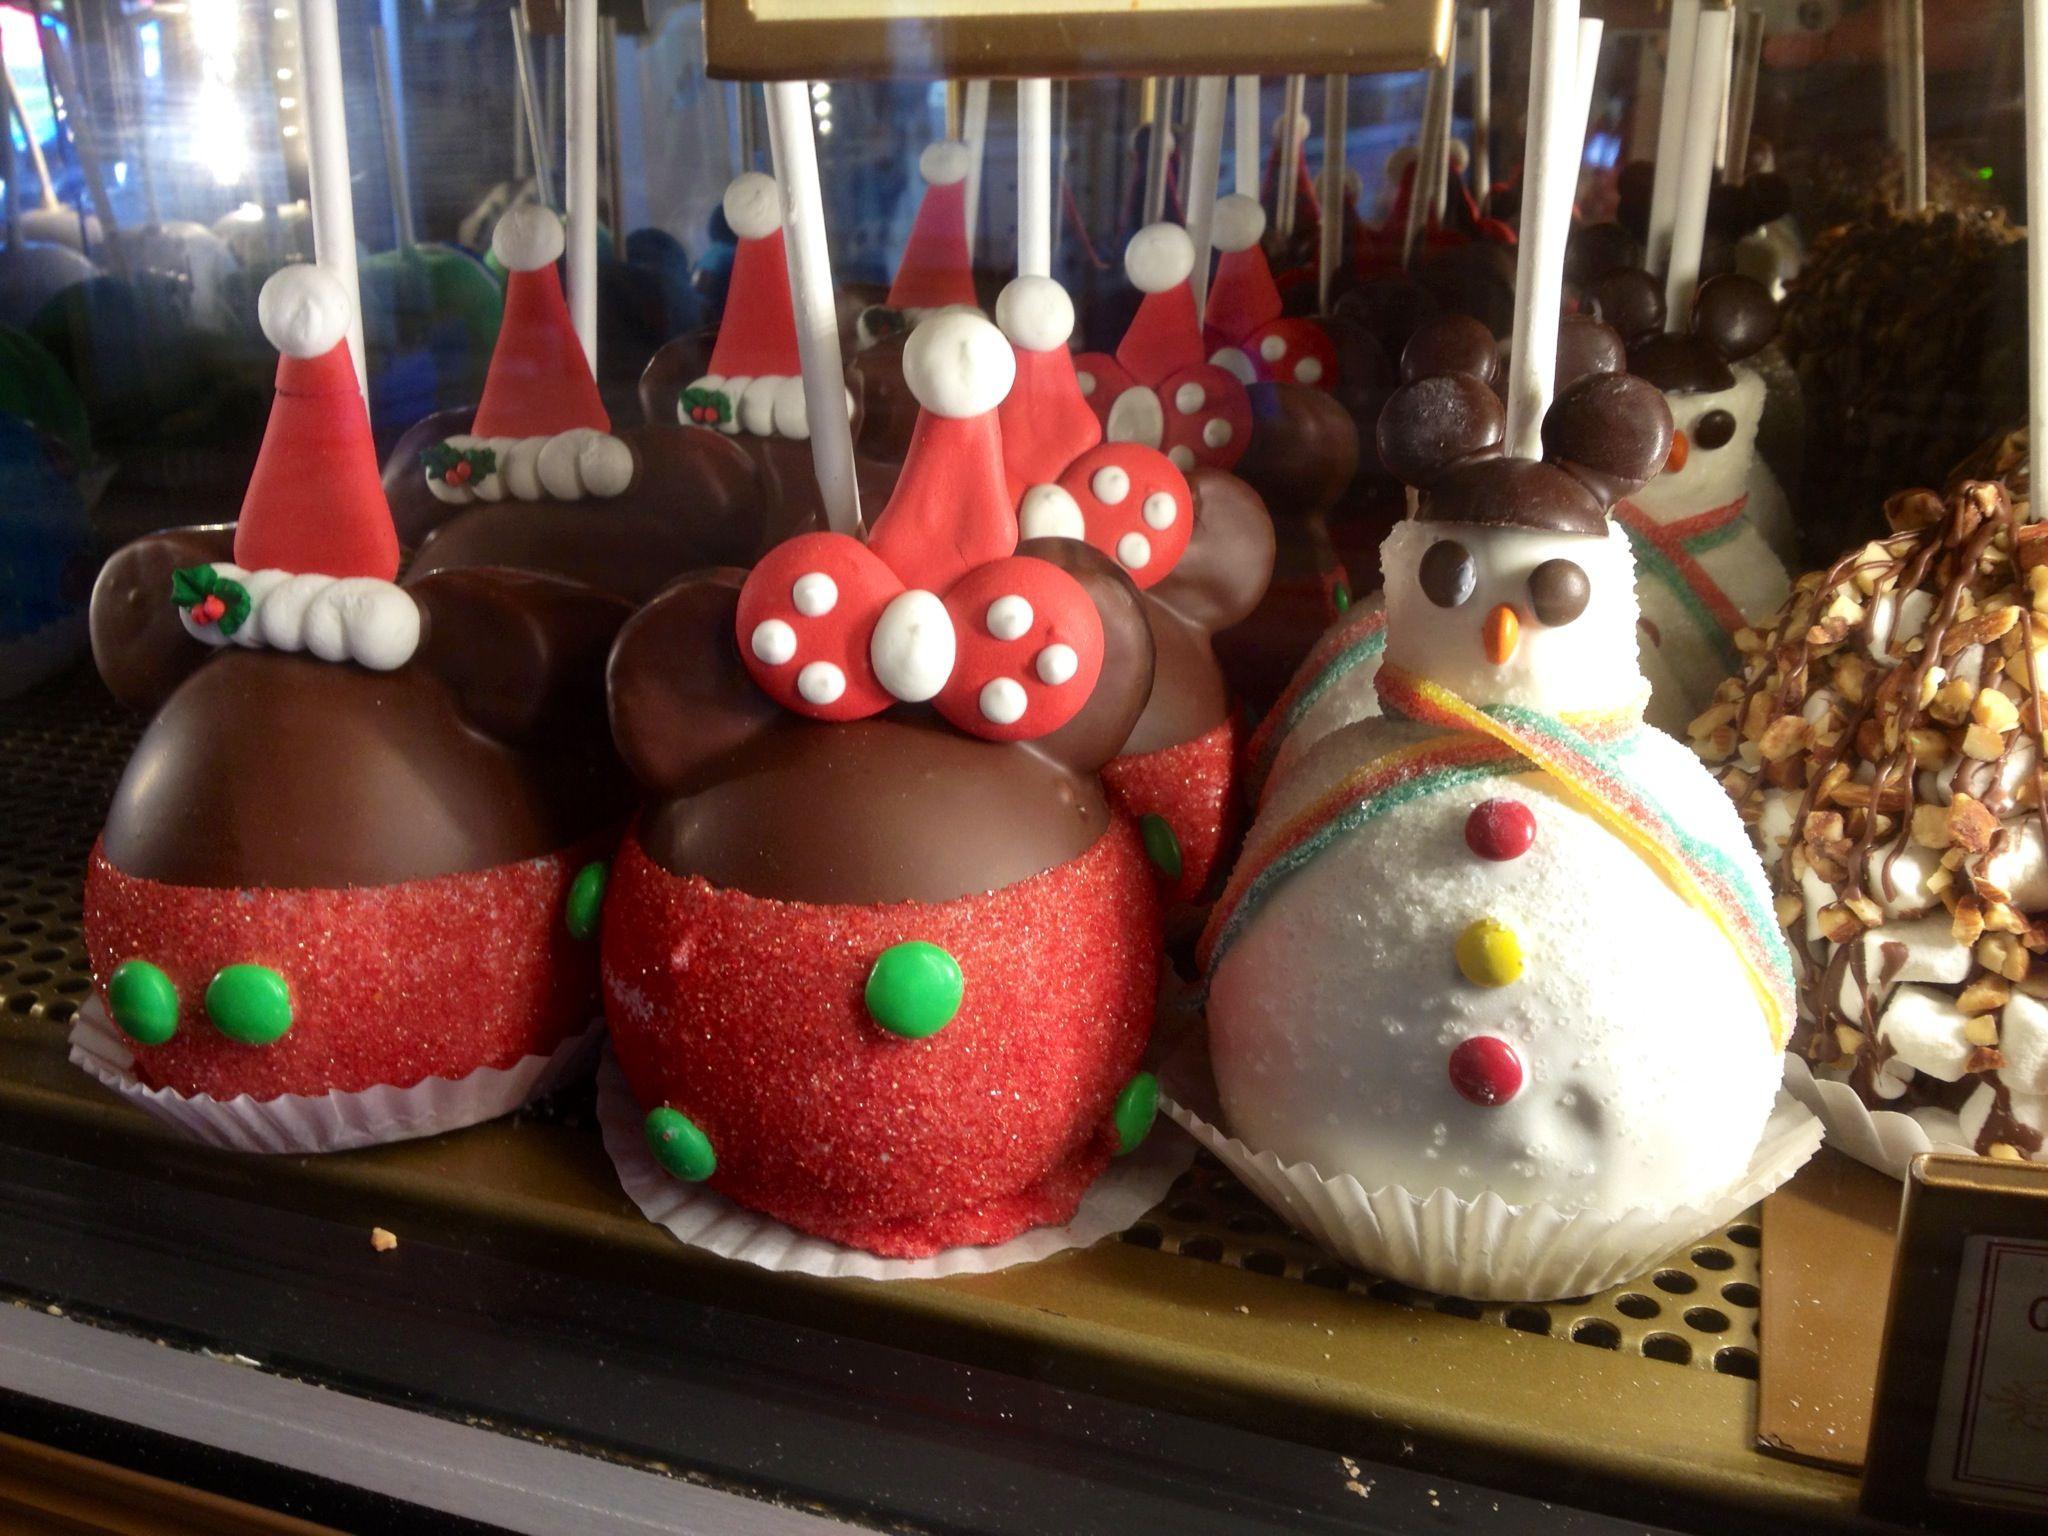 Christmas Candy Apple Ideas  Holiday Caramel Apples at Disneyland